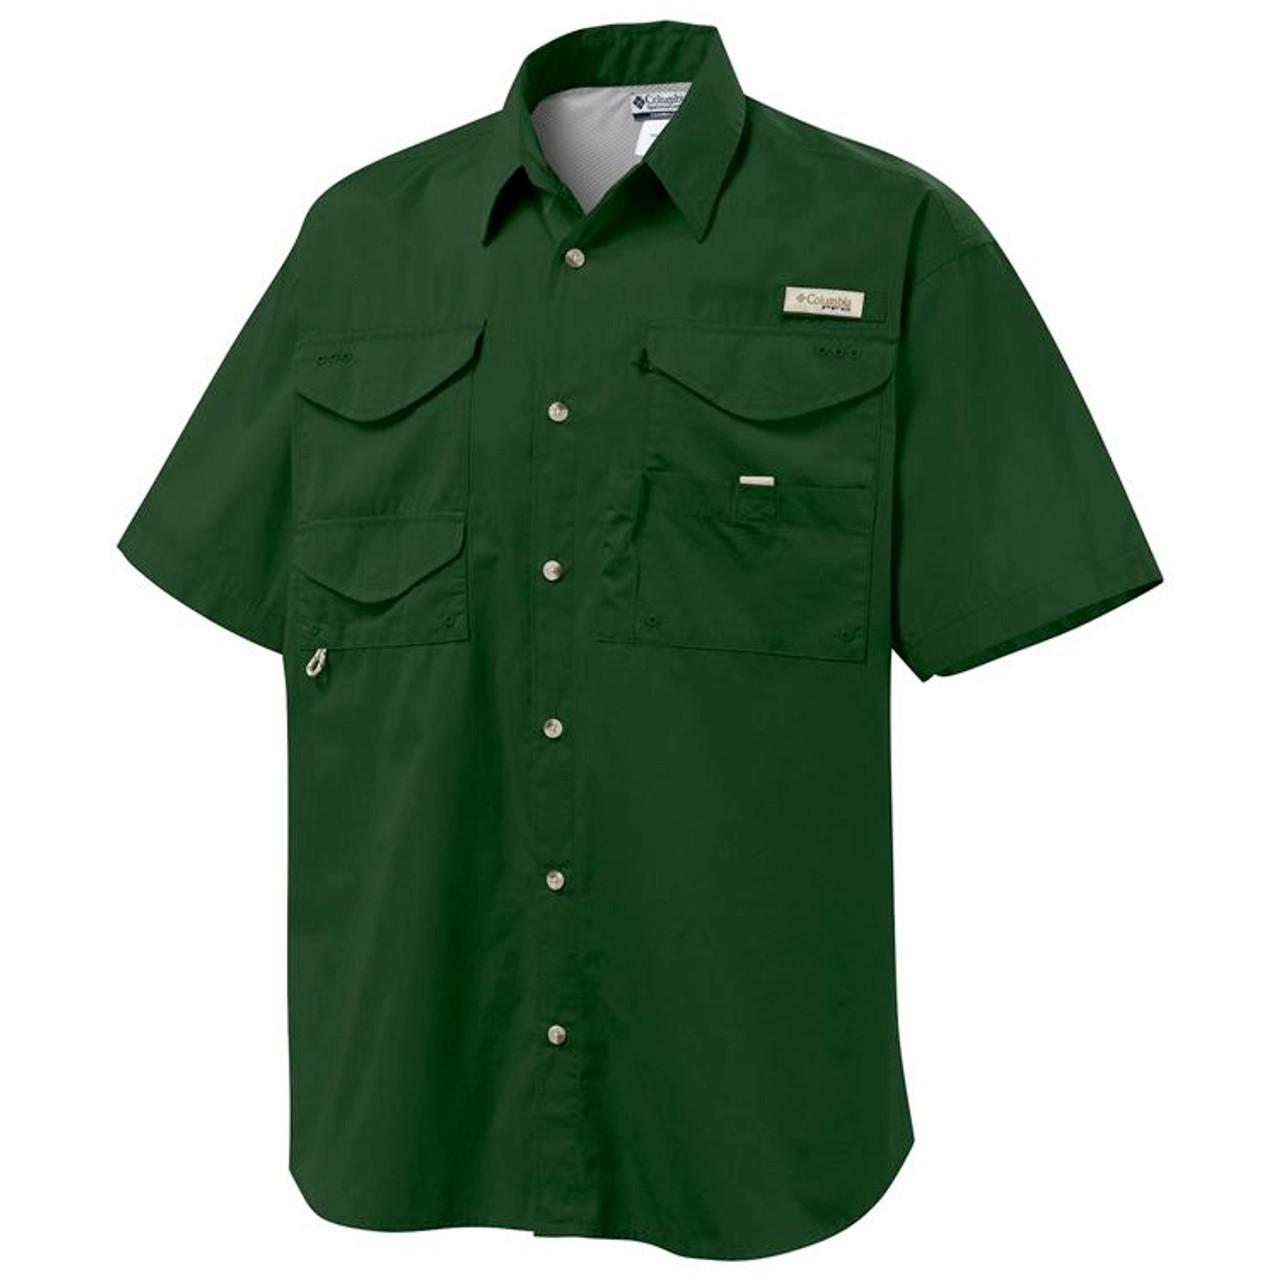 5ab74da93d6 Columbia PFG Bonehead Men's Short-Sleeve Shirt - GolfEtail.com